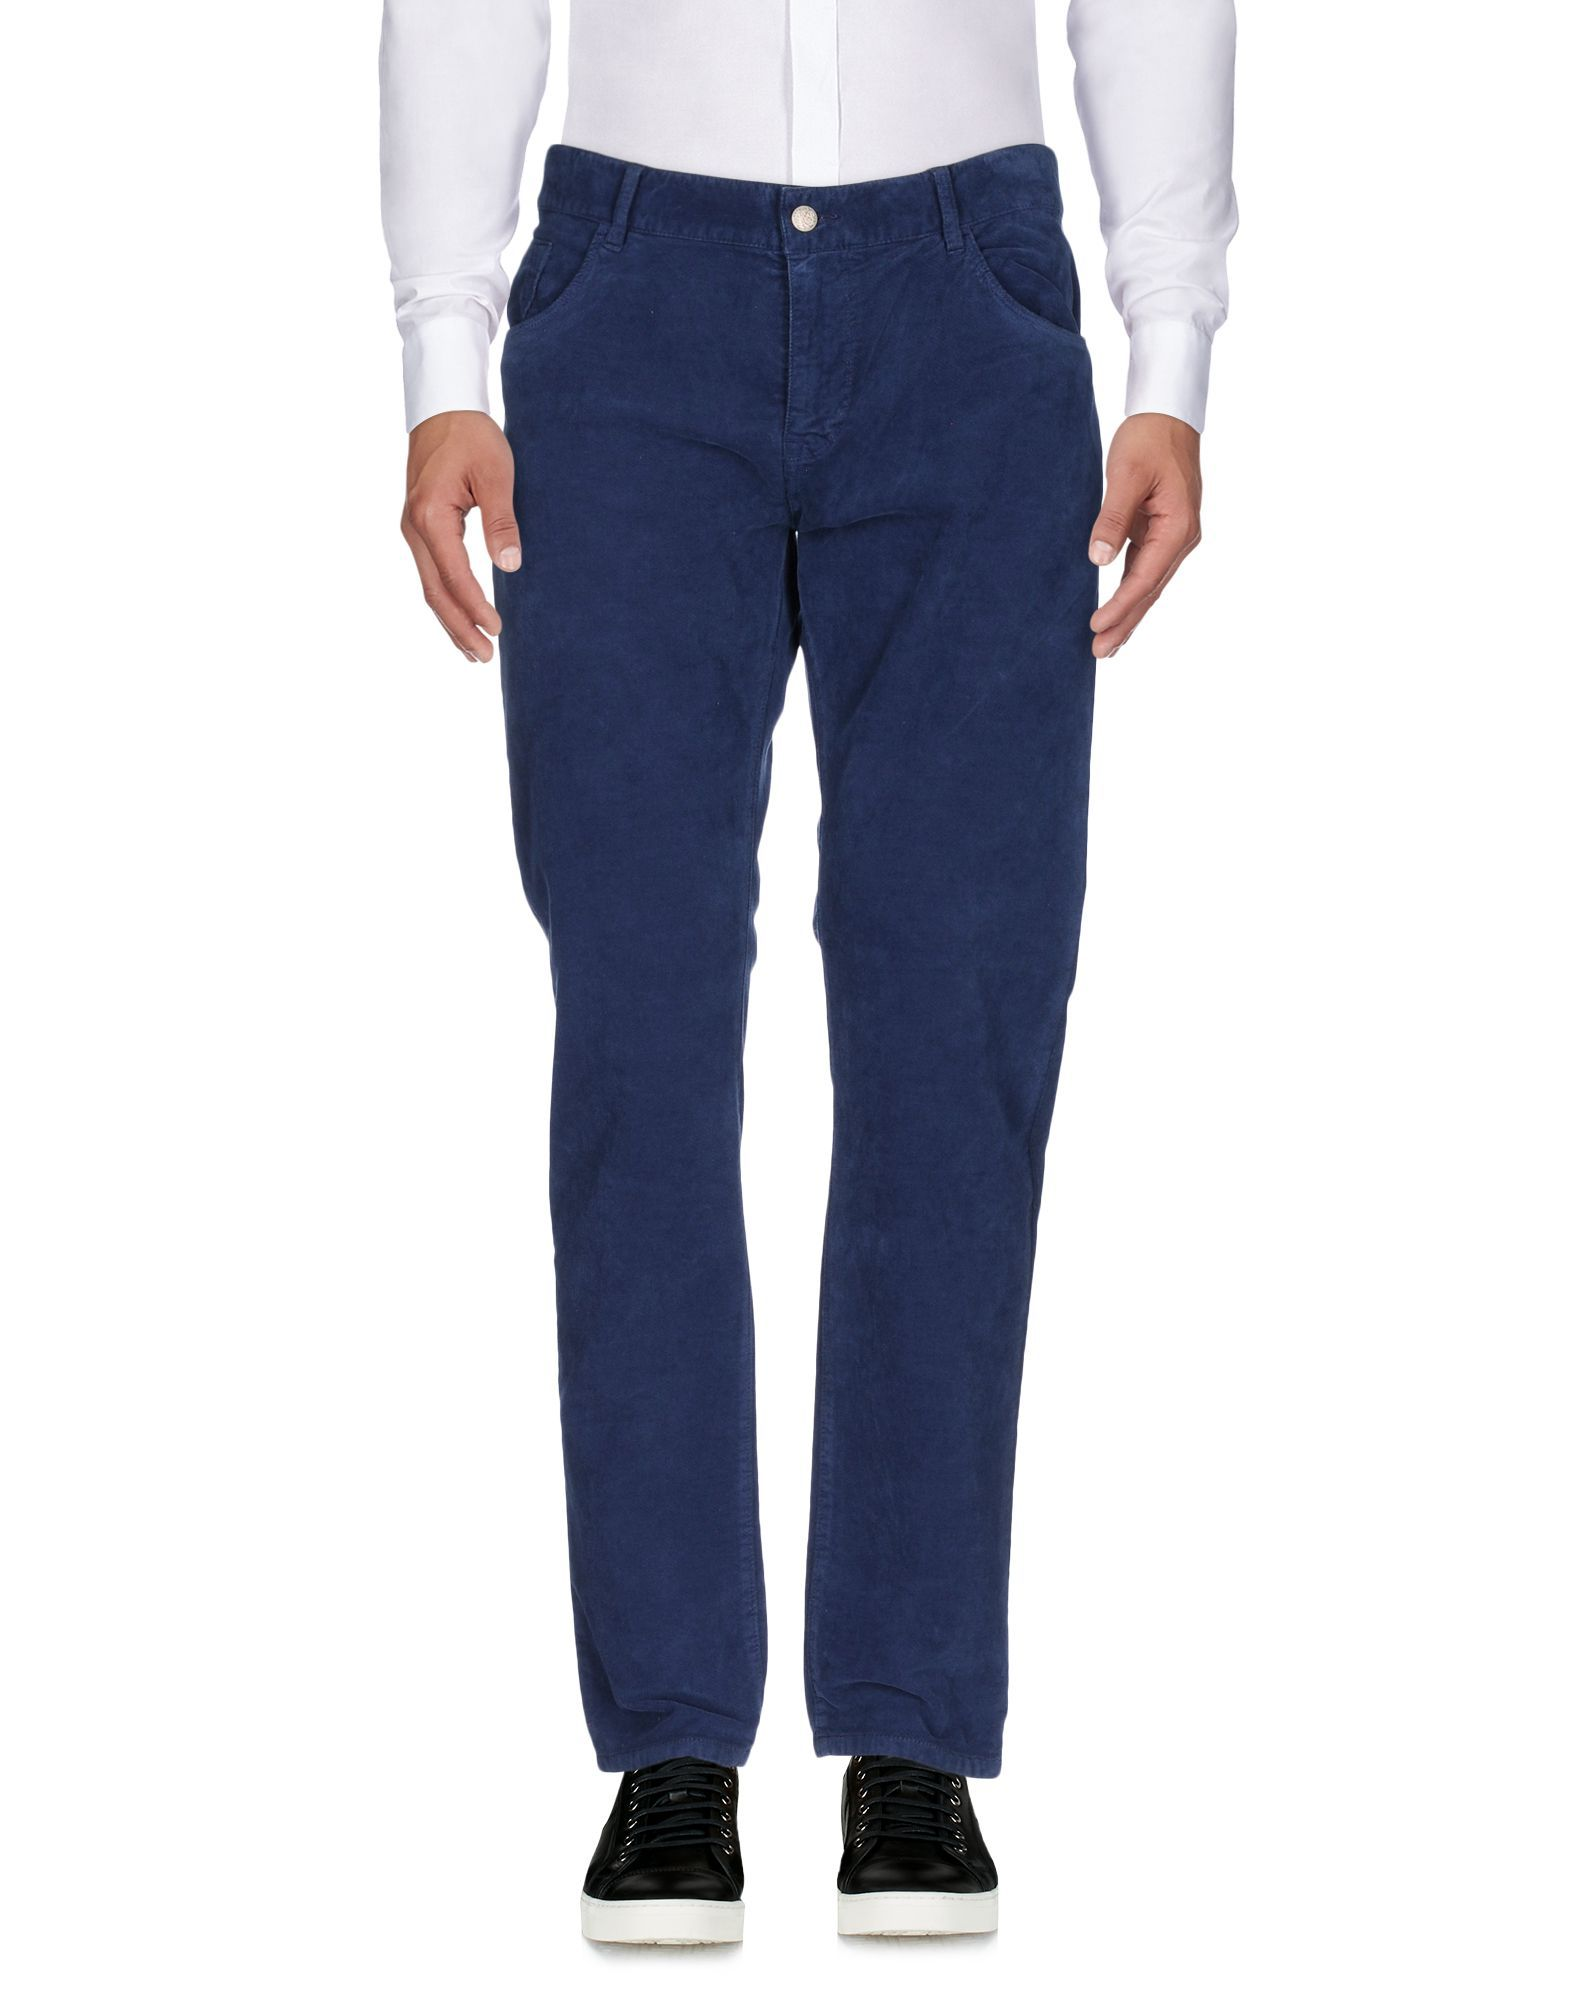 TROUSERS Seventy Sergio Tegon Blue Man Cotton